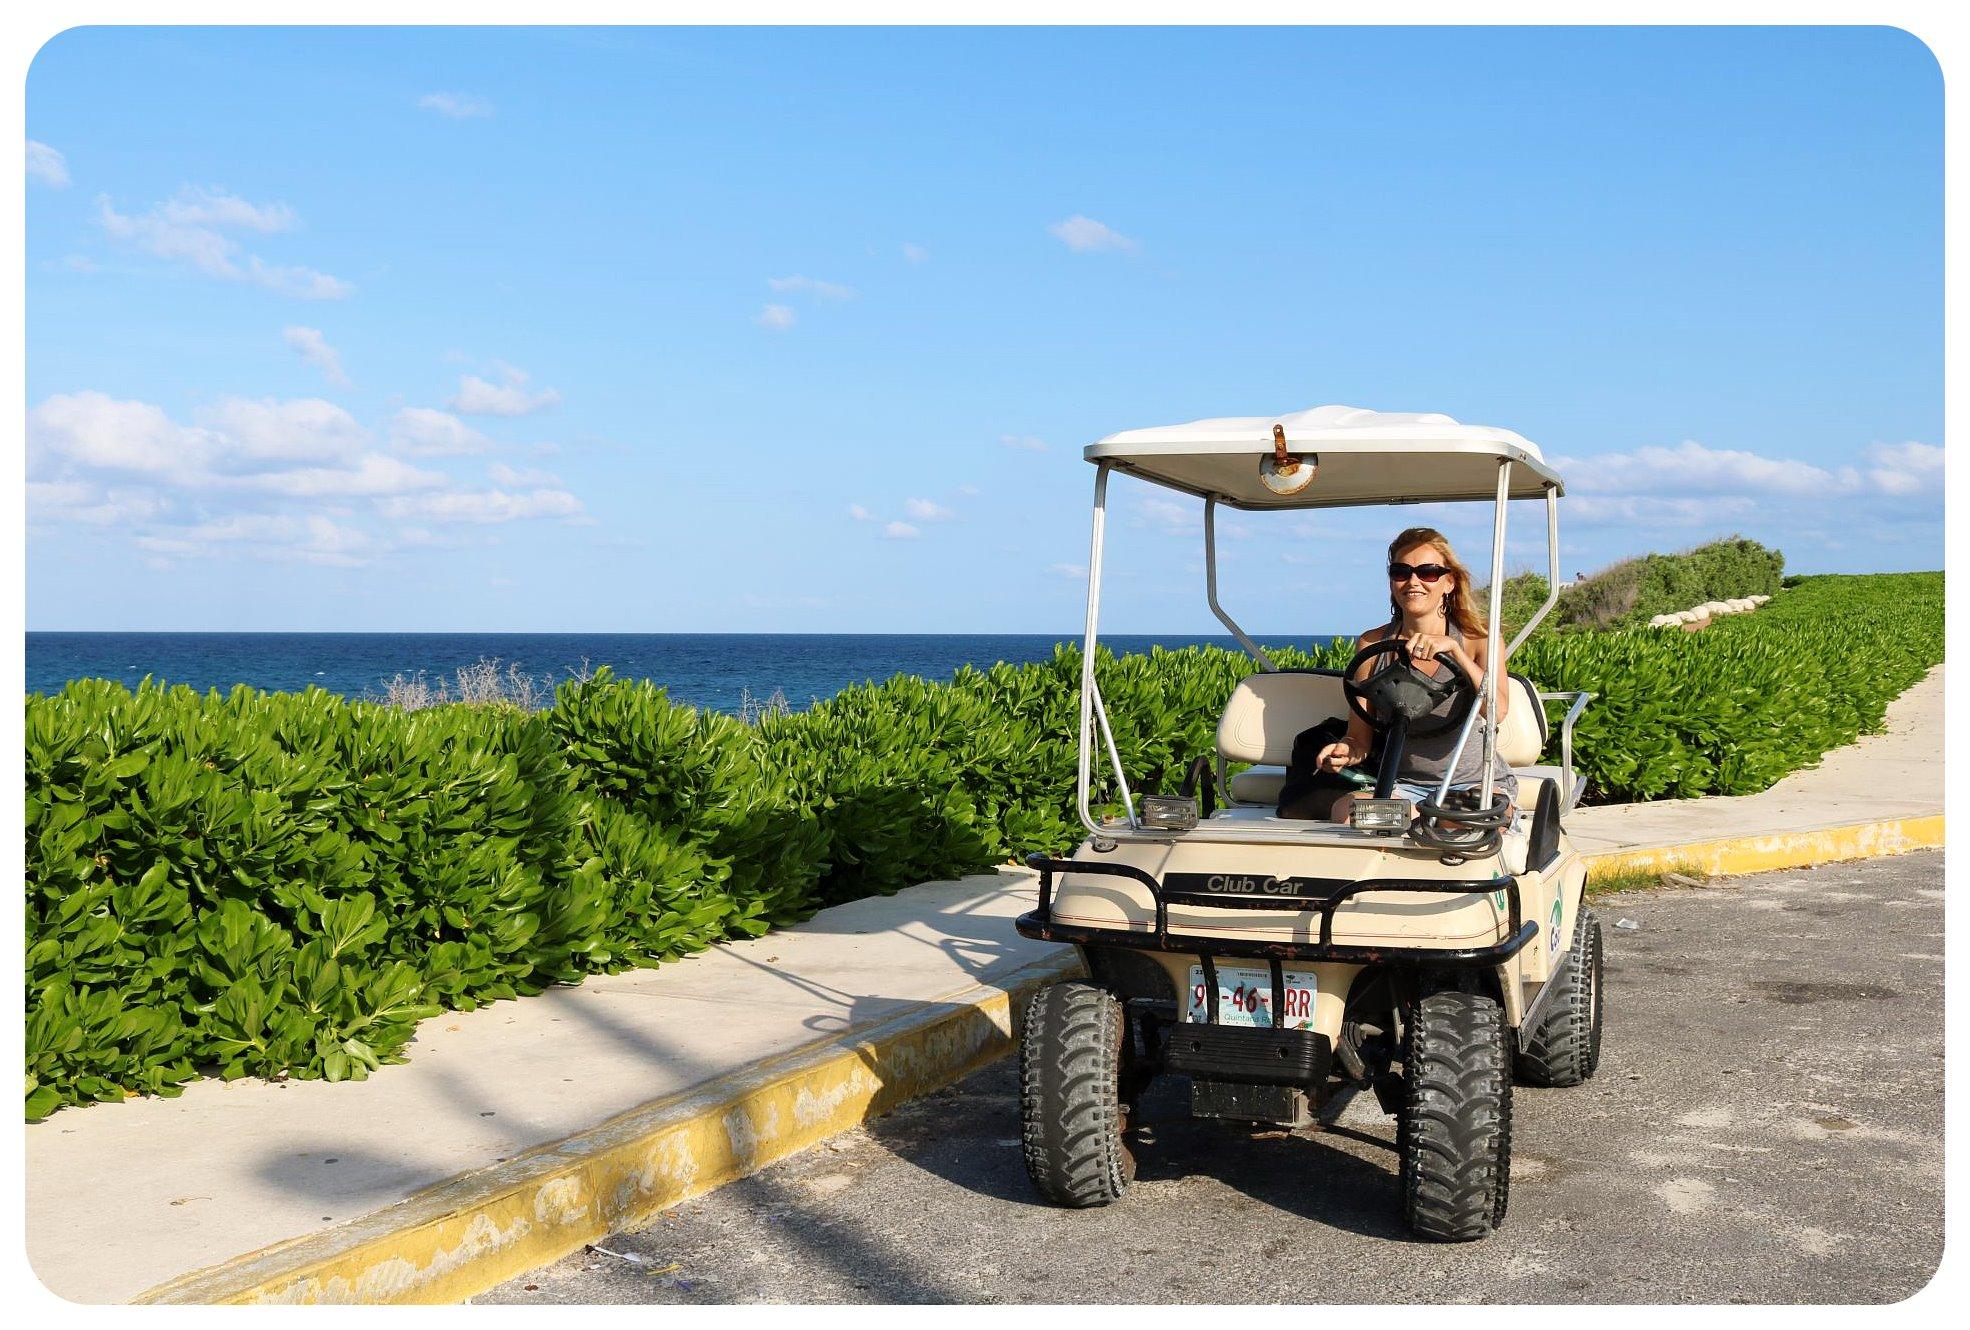 isla mujeres dani golf kart